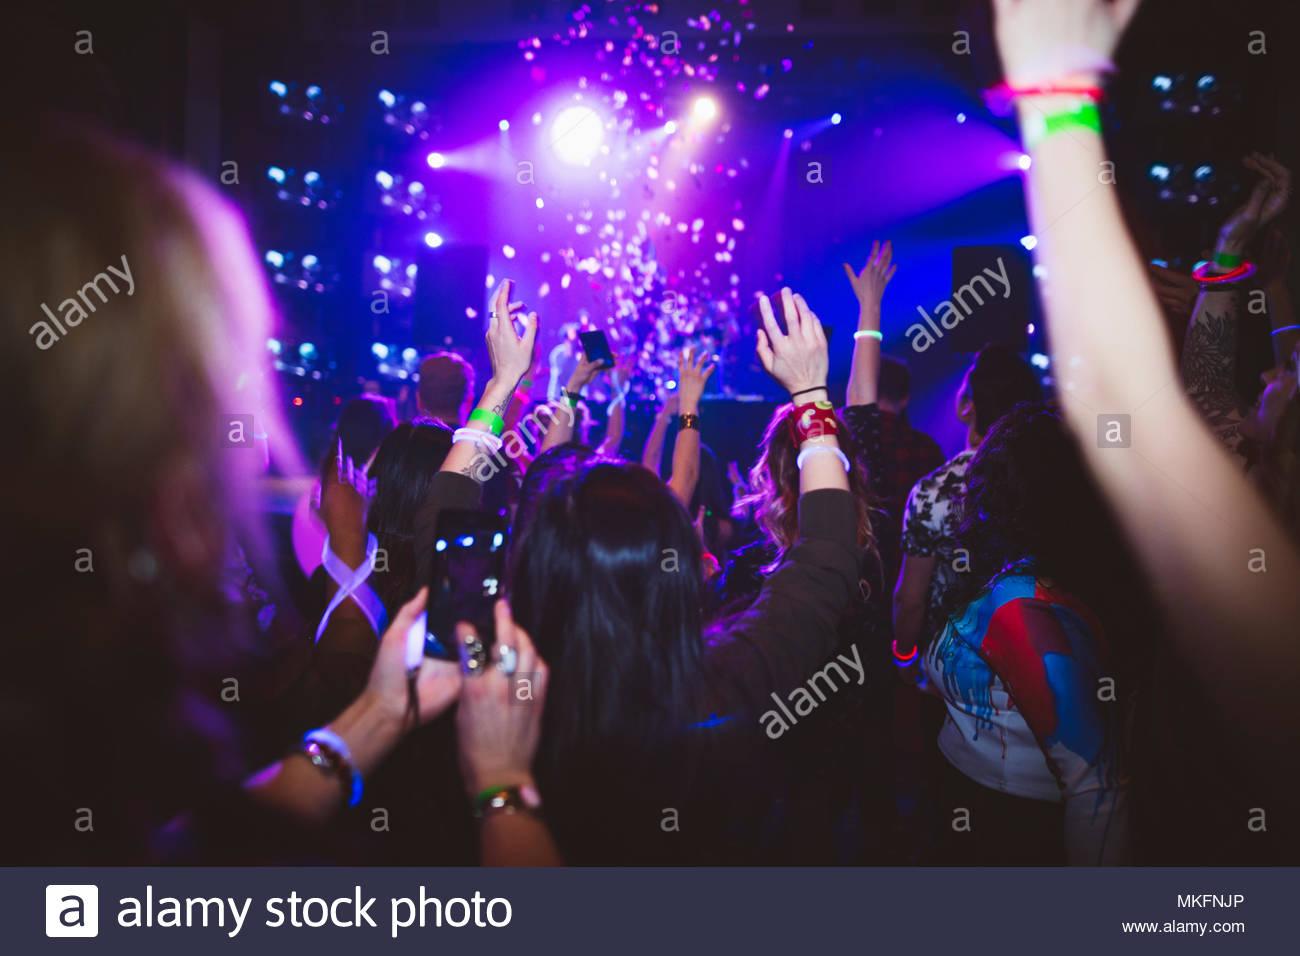 Millennial dancing, partying in nightclub - Stock Image